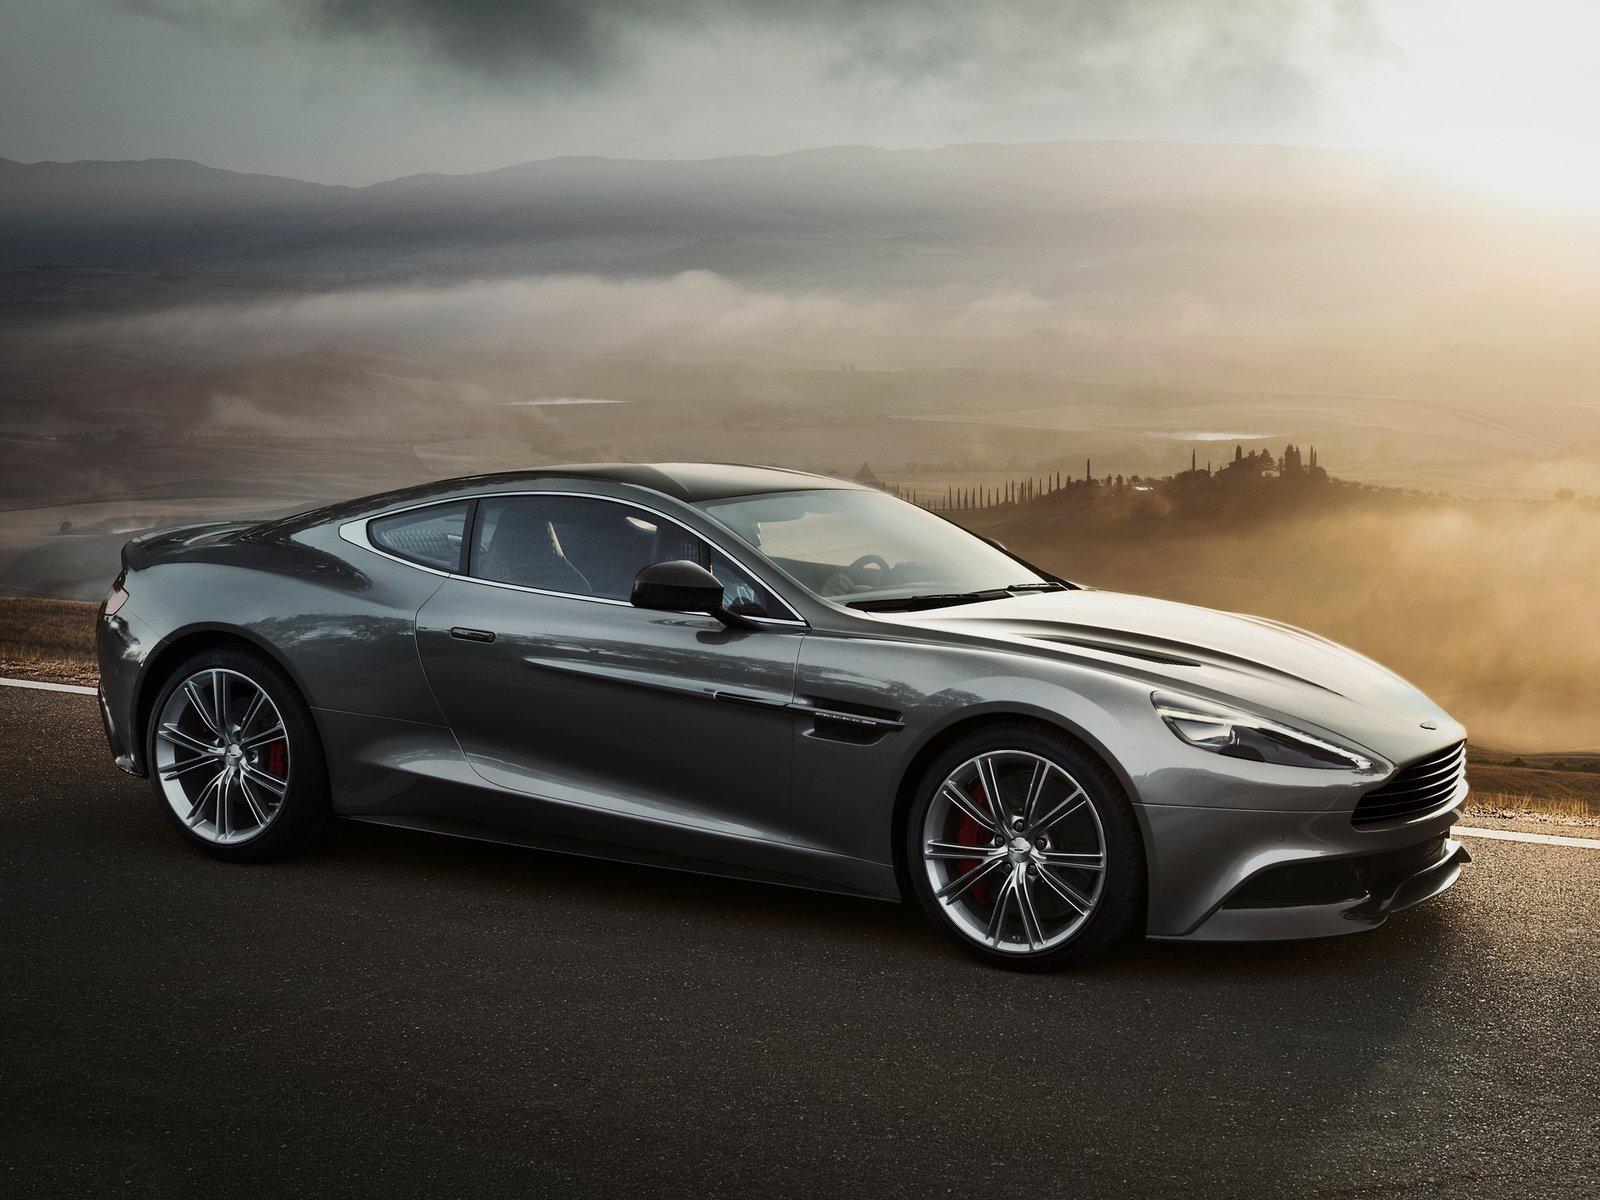 Aston Martin Cars Photos And Aston Martin Cars Interior Full Hd